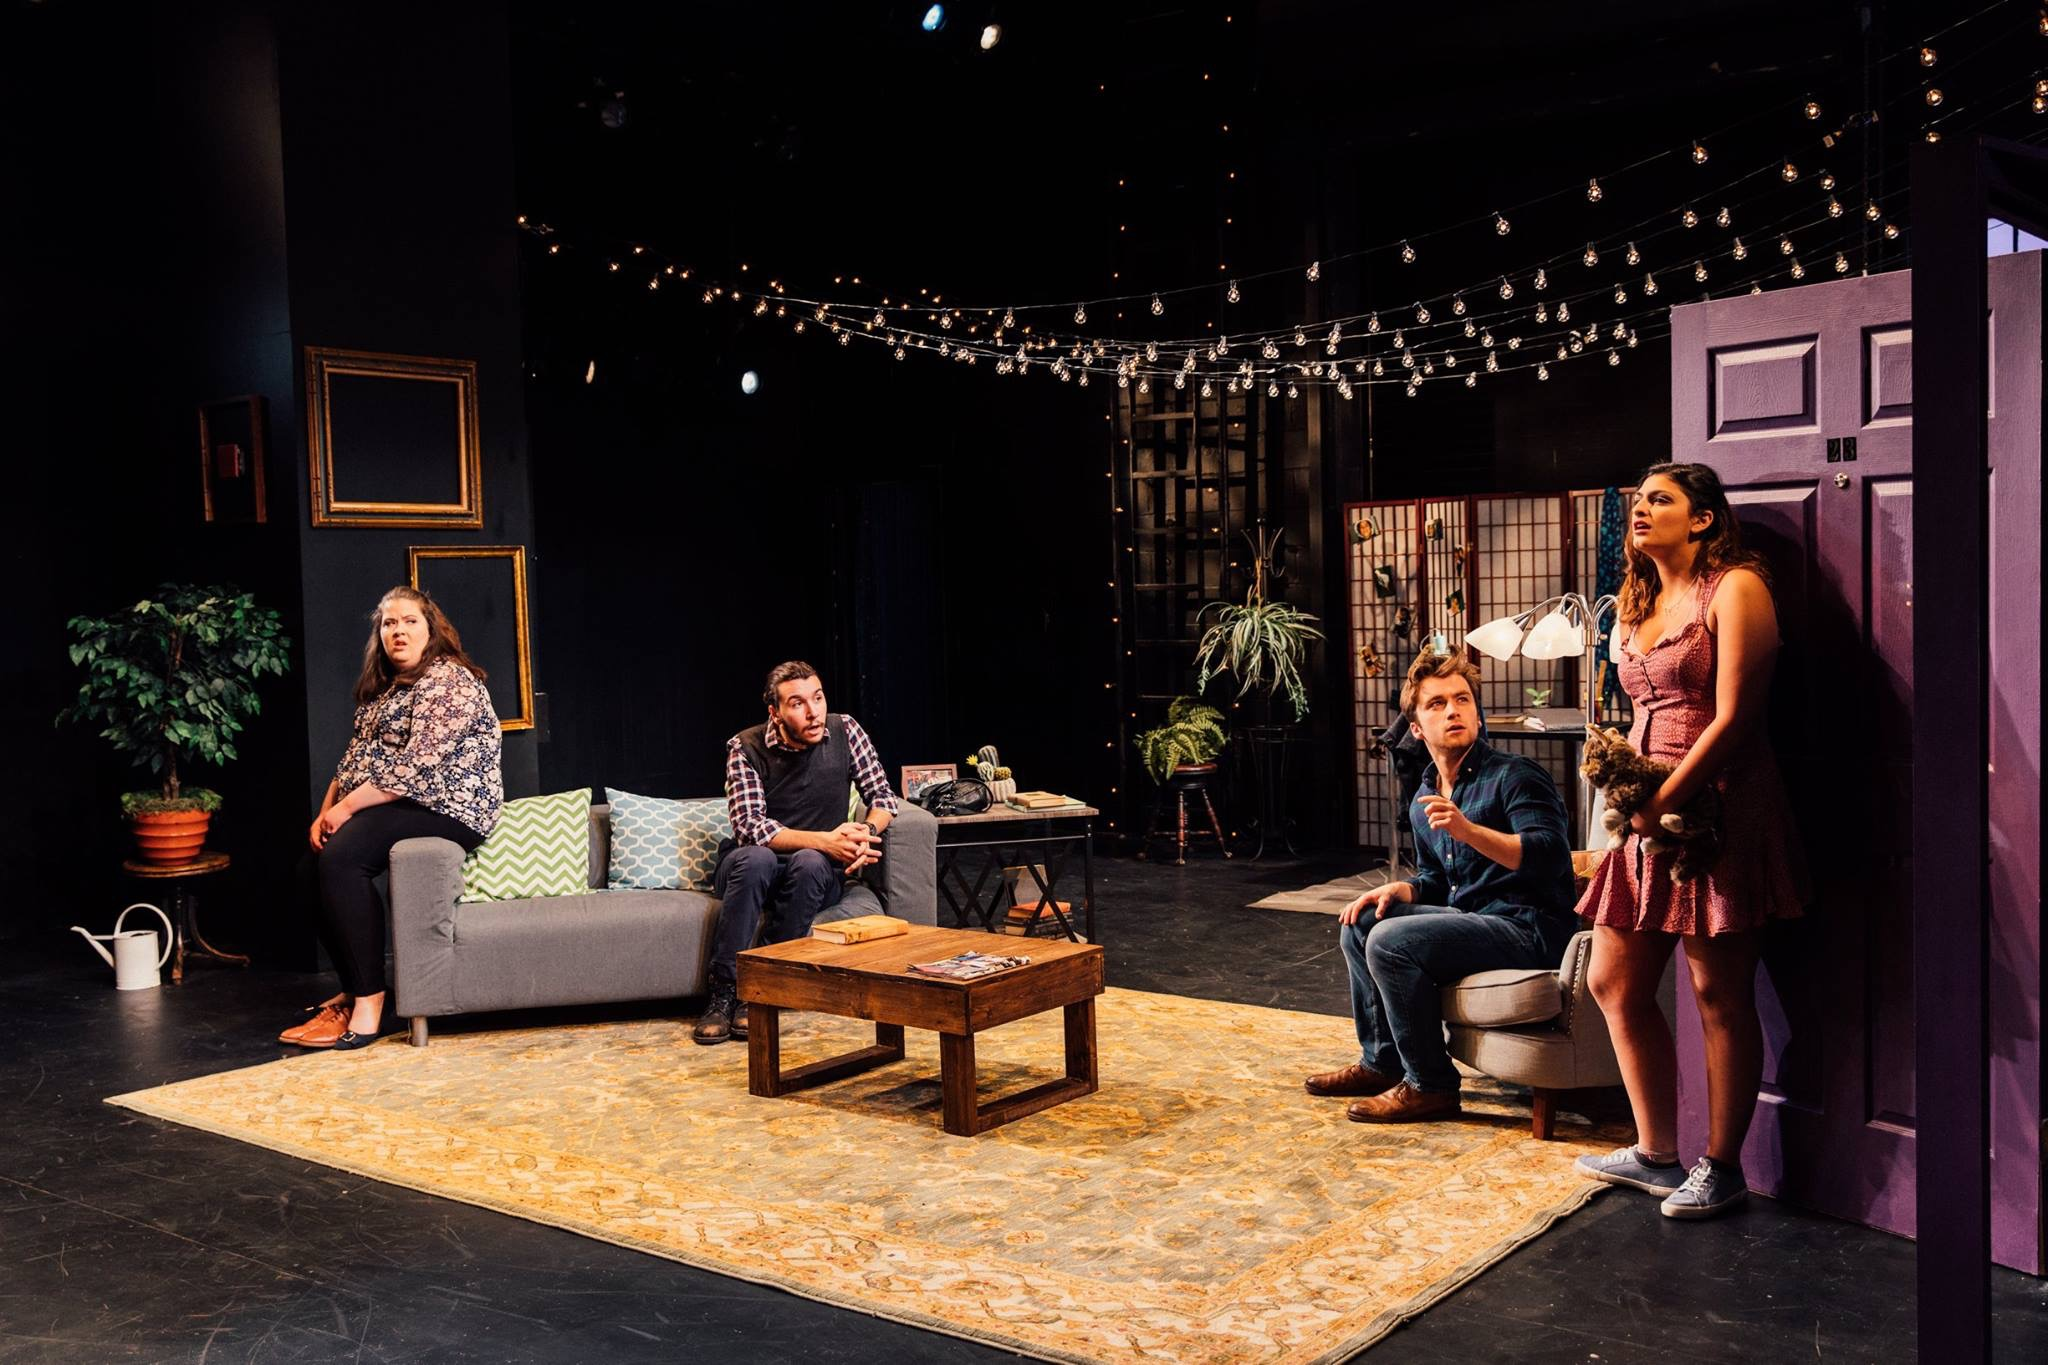 From left: Diane (Caroline Parker), Stanley, Evan (Cameron Bell), and Mirabelle (Cristina D'Anna). Spring 2019.